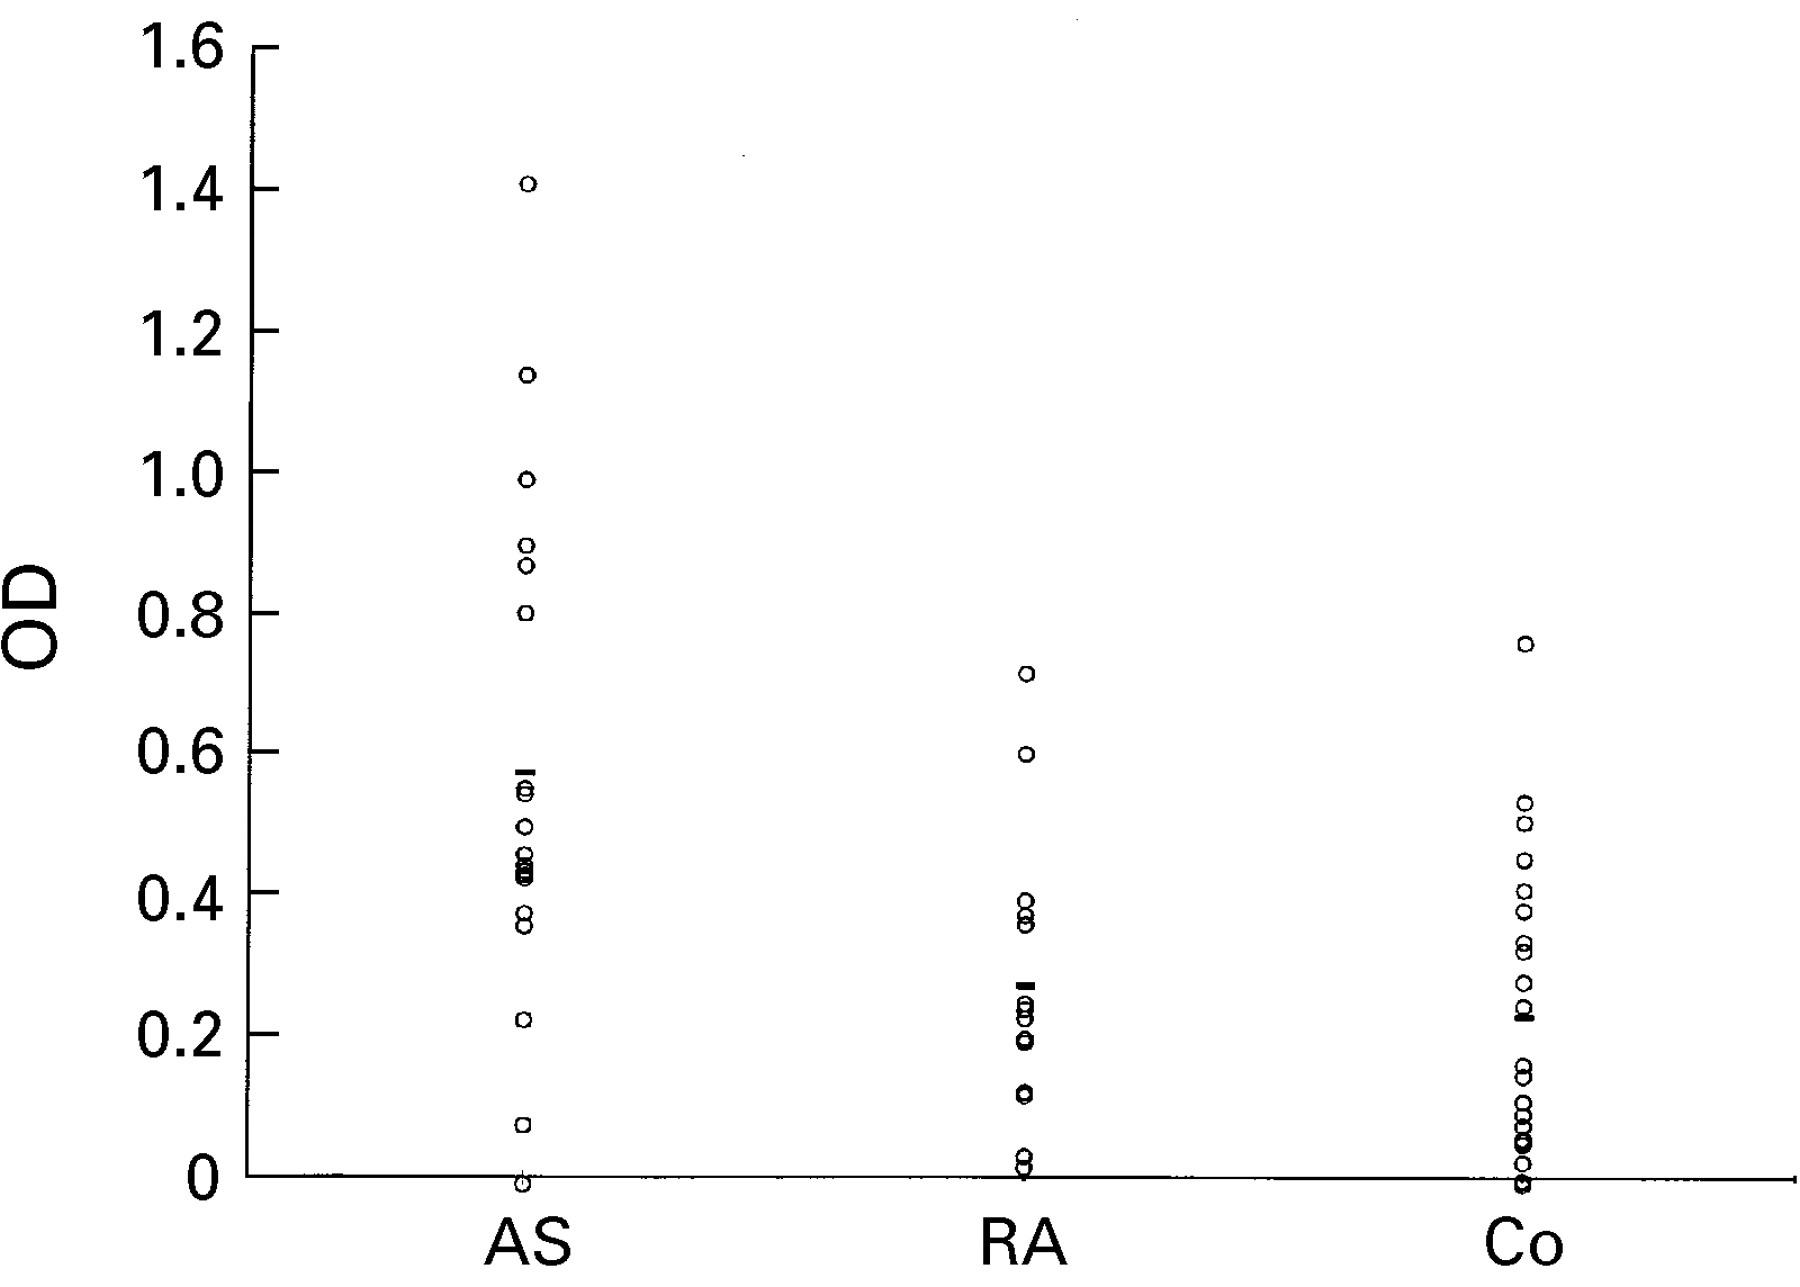 unknown microbiology lab report on klebsiella pneumoniae Microbiology unknown lab report examples dissertation perceptions of education klebsiella pneumoniae, g- single coccobacilli, (blue) non-acid fast.